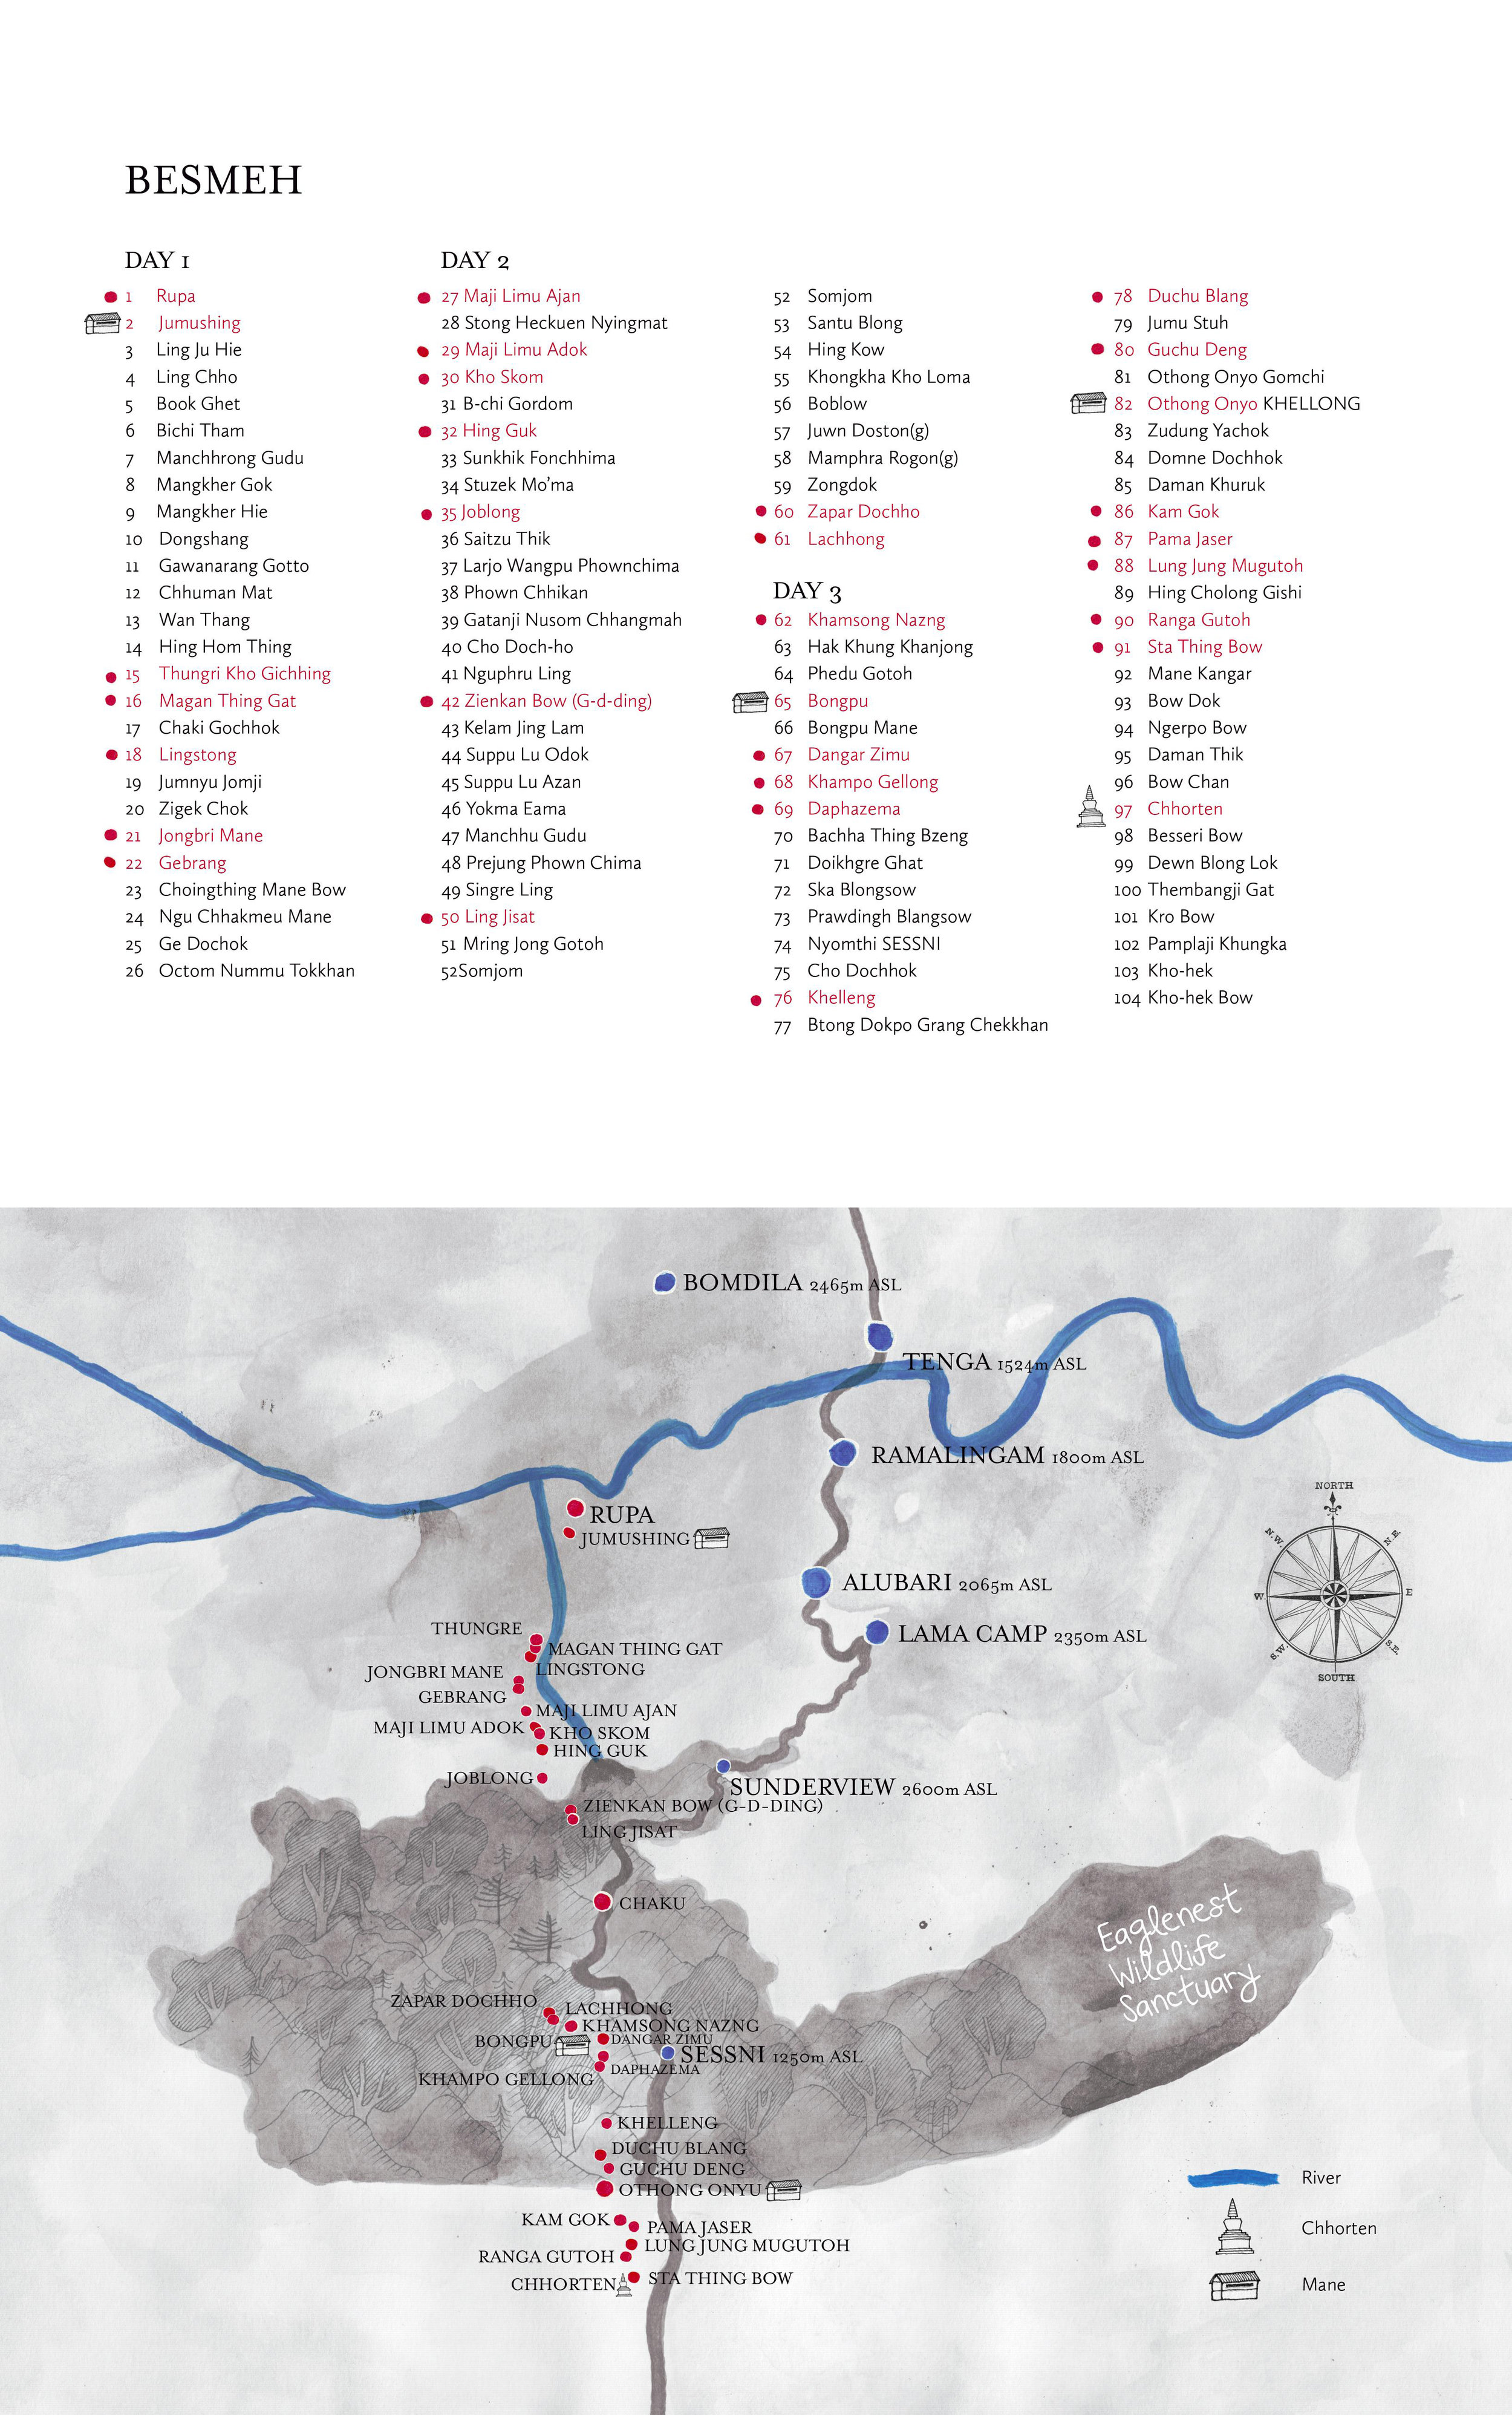 Map of Besmeh, Arunachal Pradesh